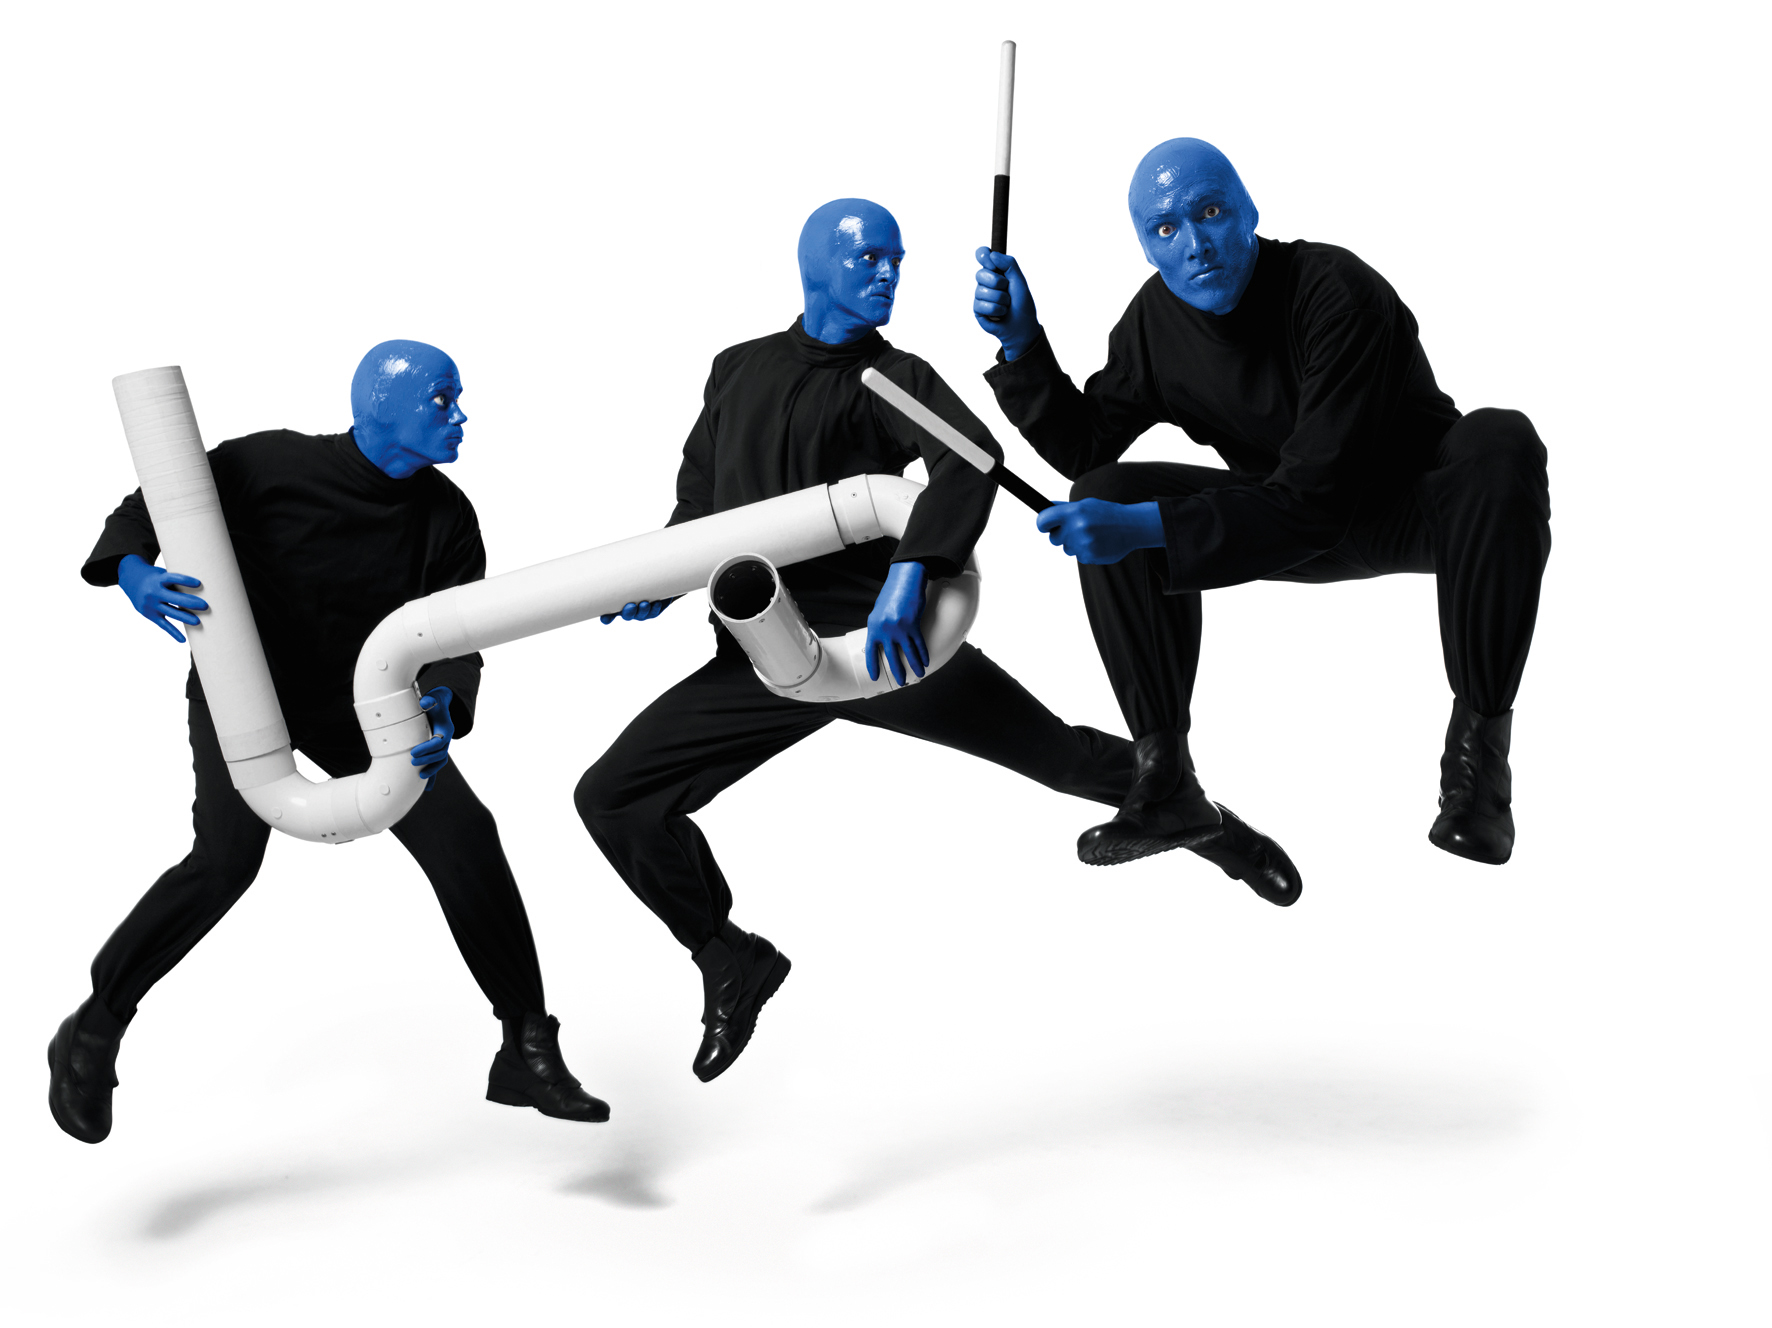 Blueman group tour like that